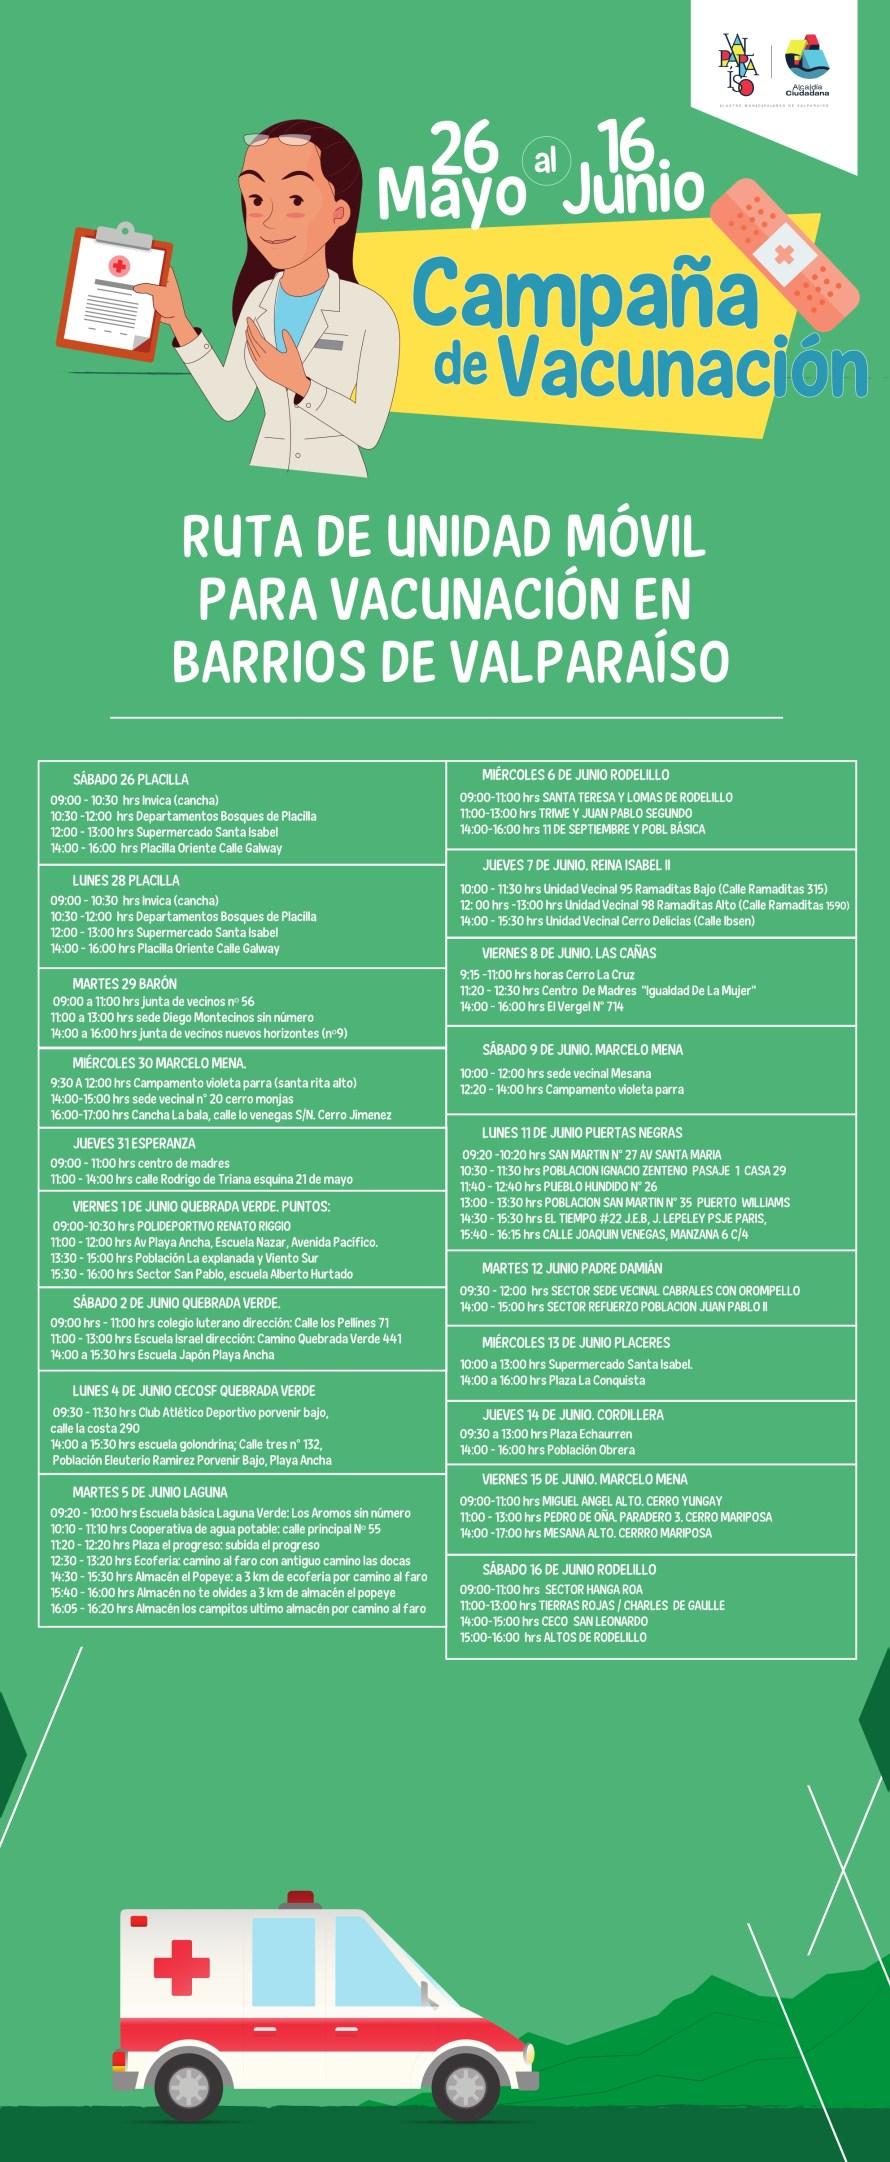 impresovacunacion(v2)trazado_001